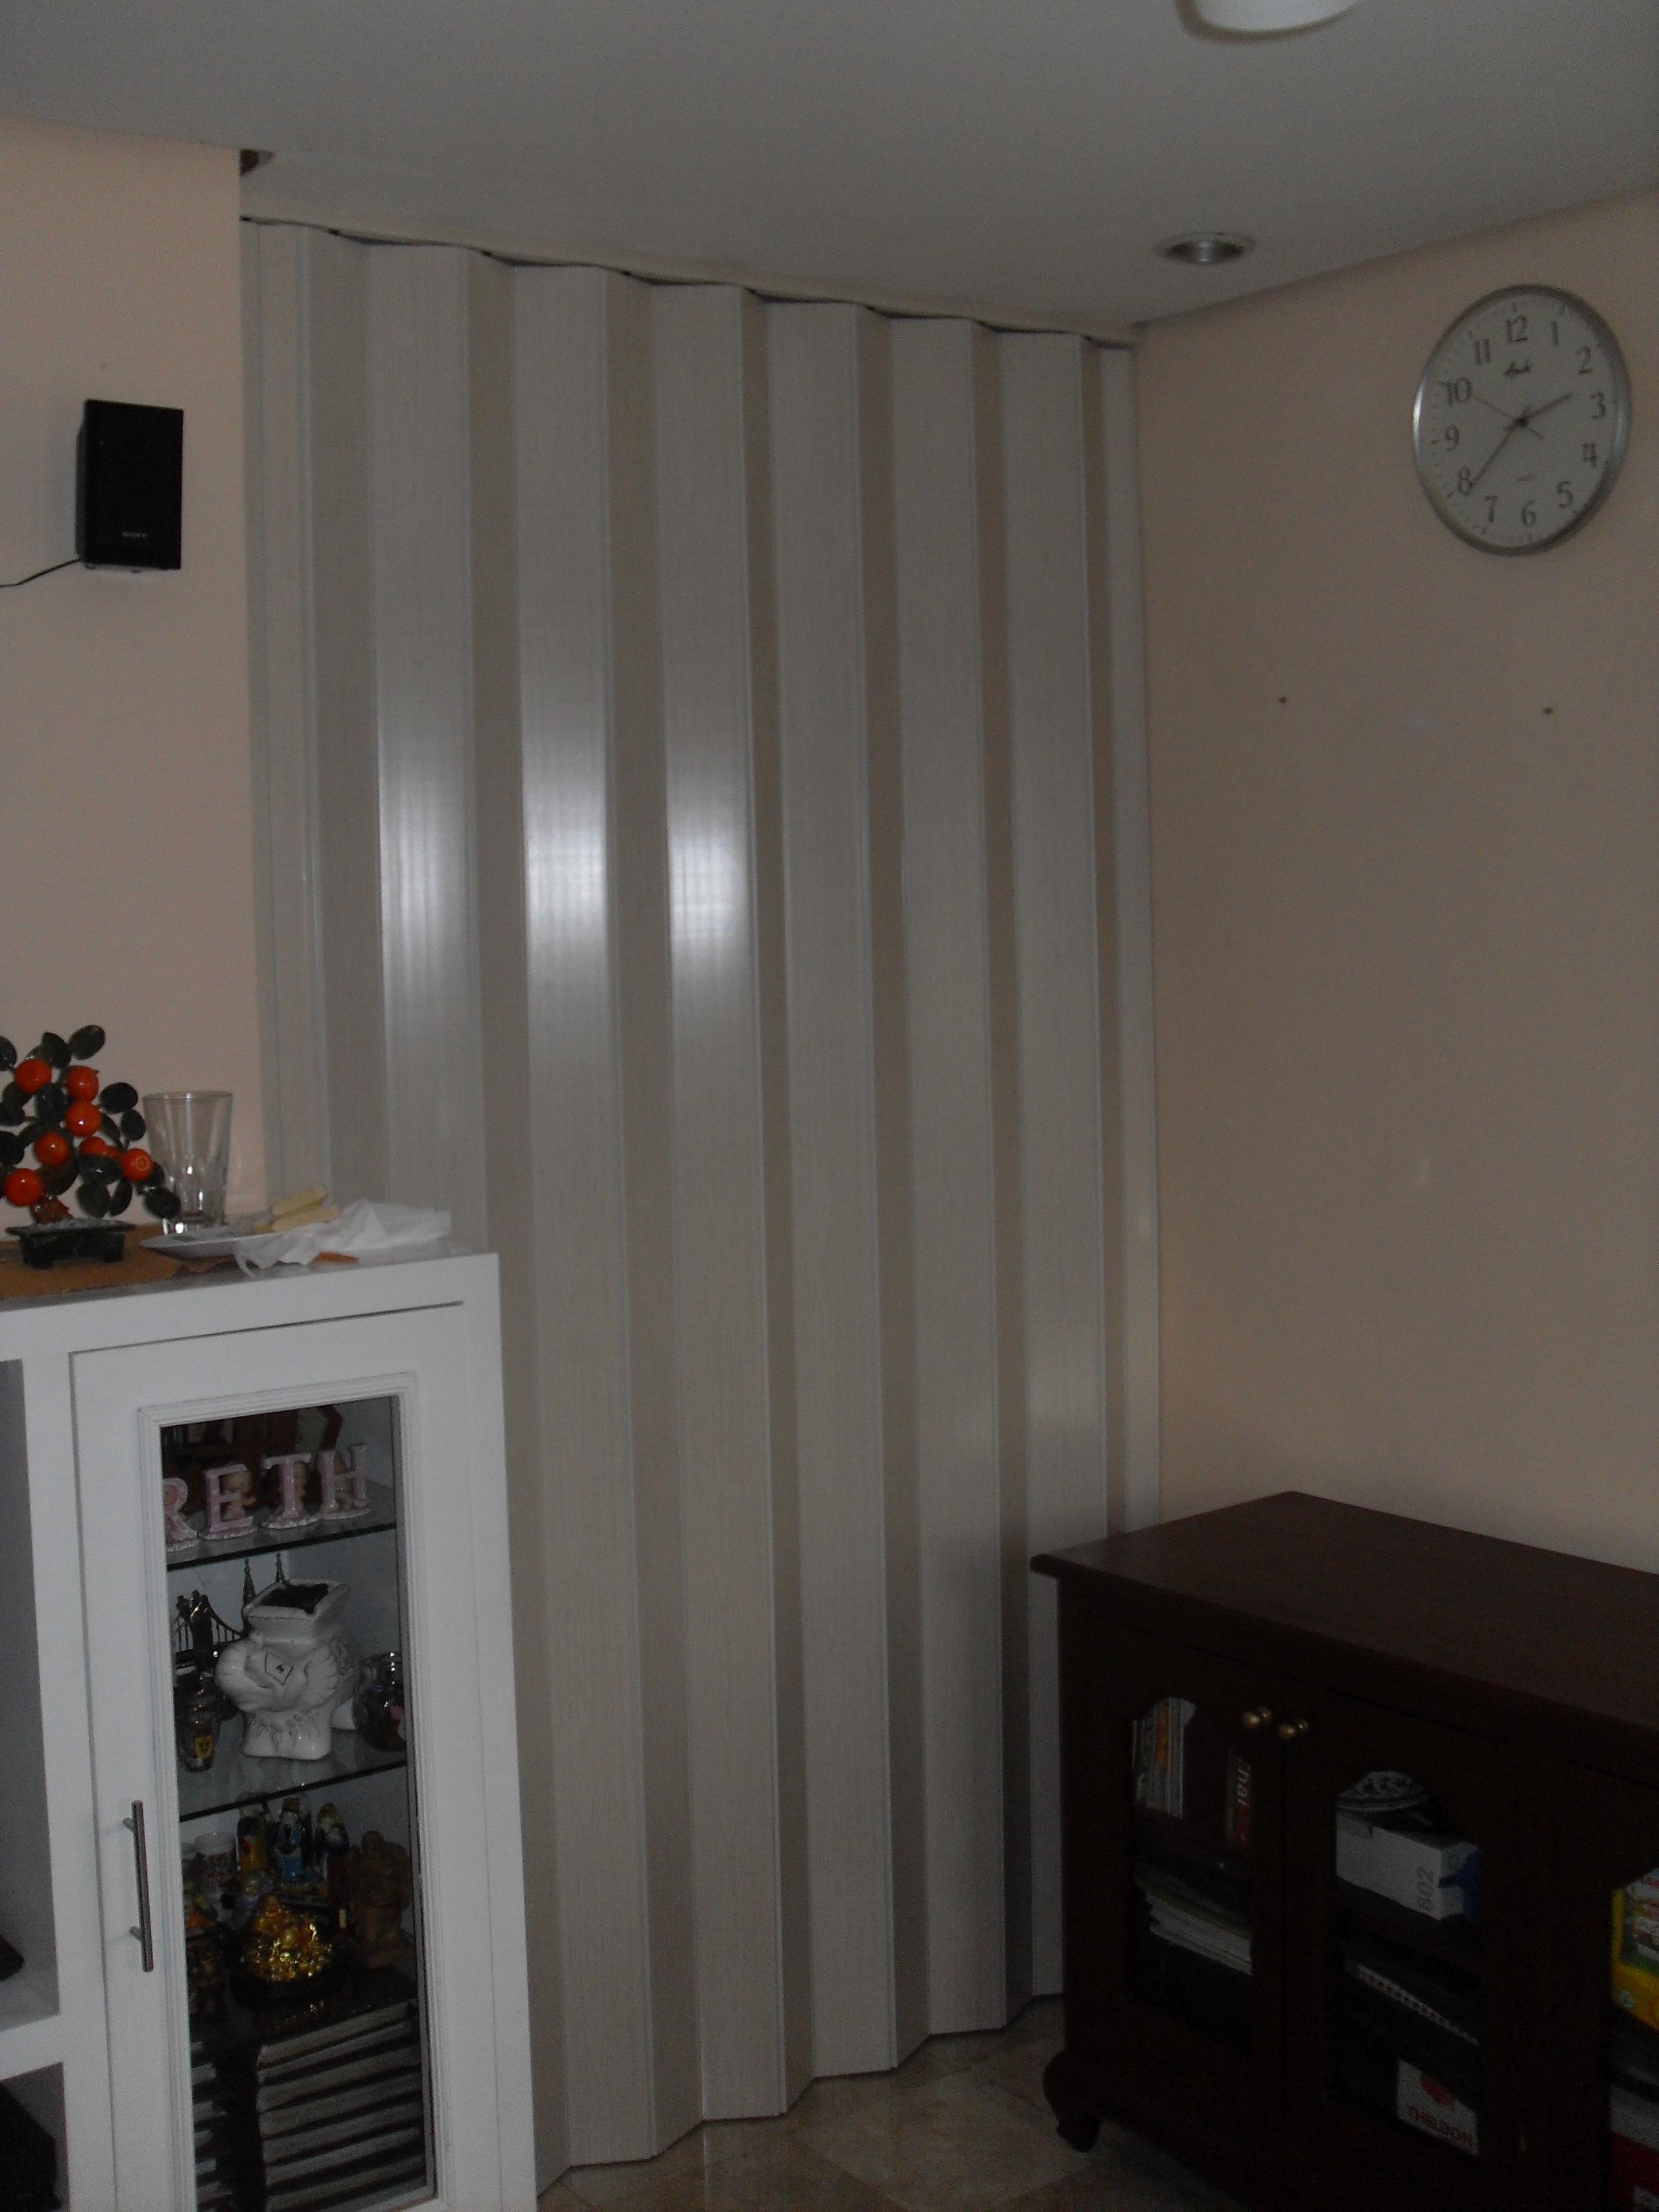 DS Windows & Walls Folding Door installation at Parañaque City